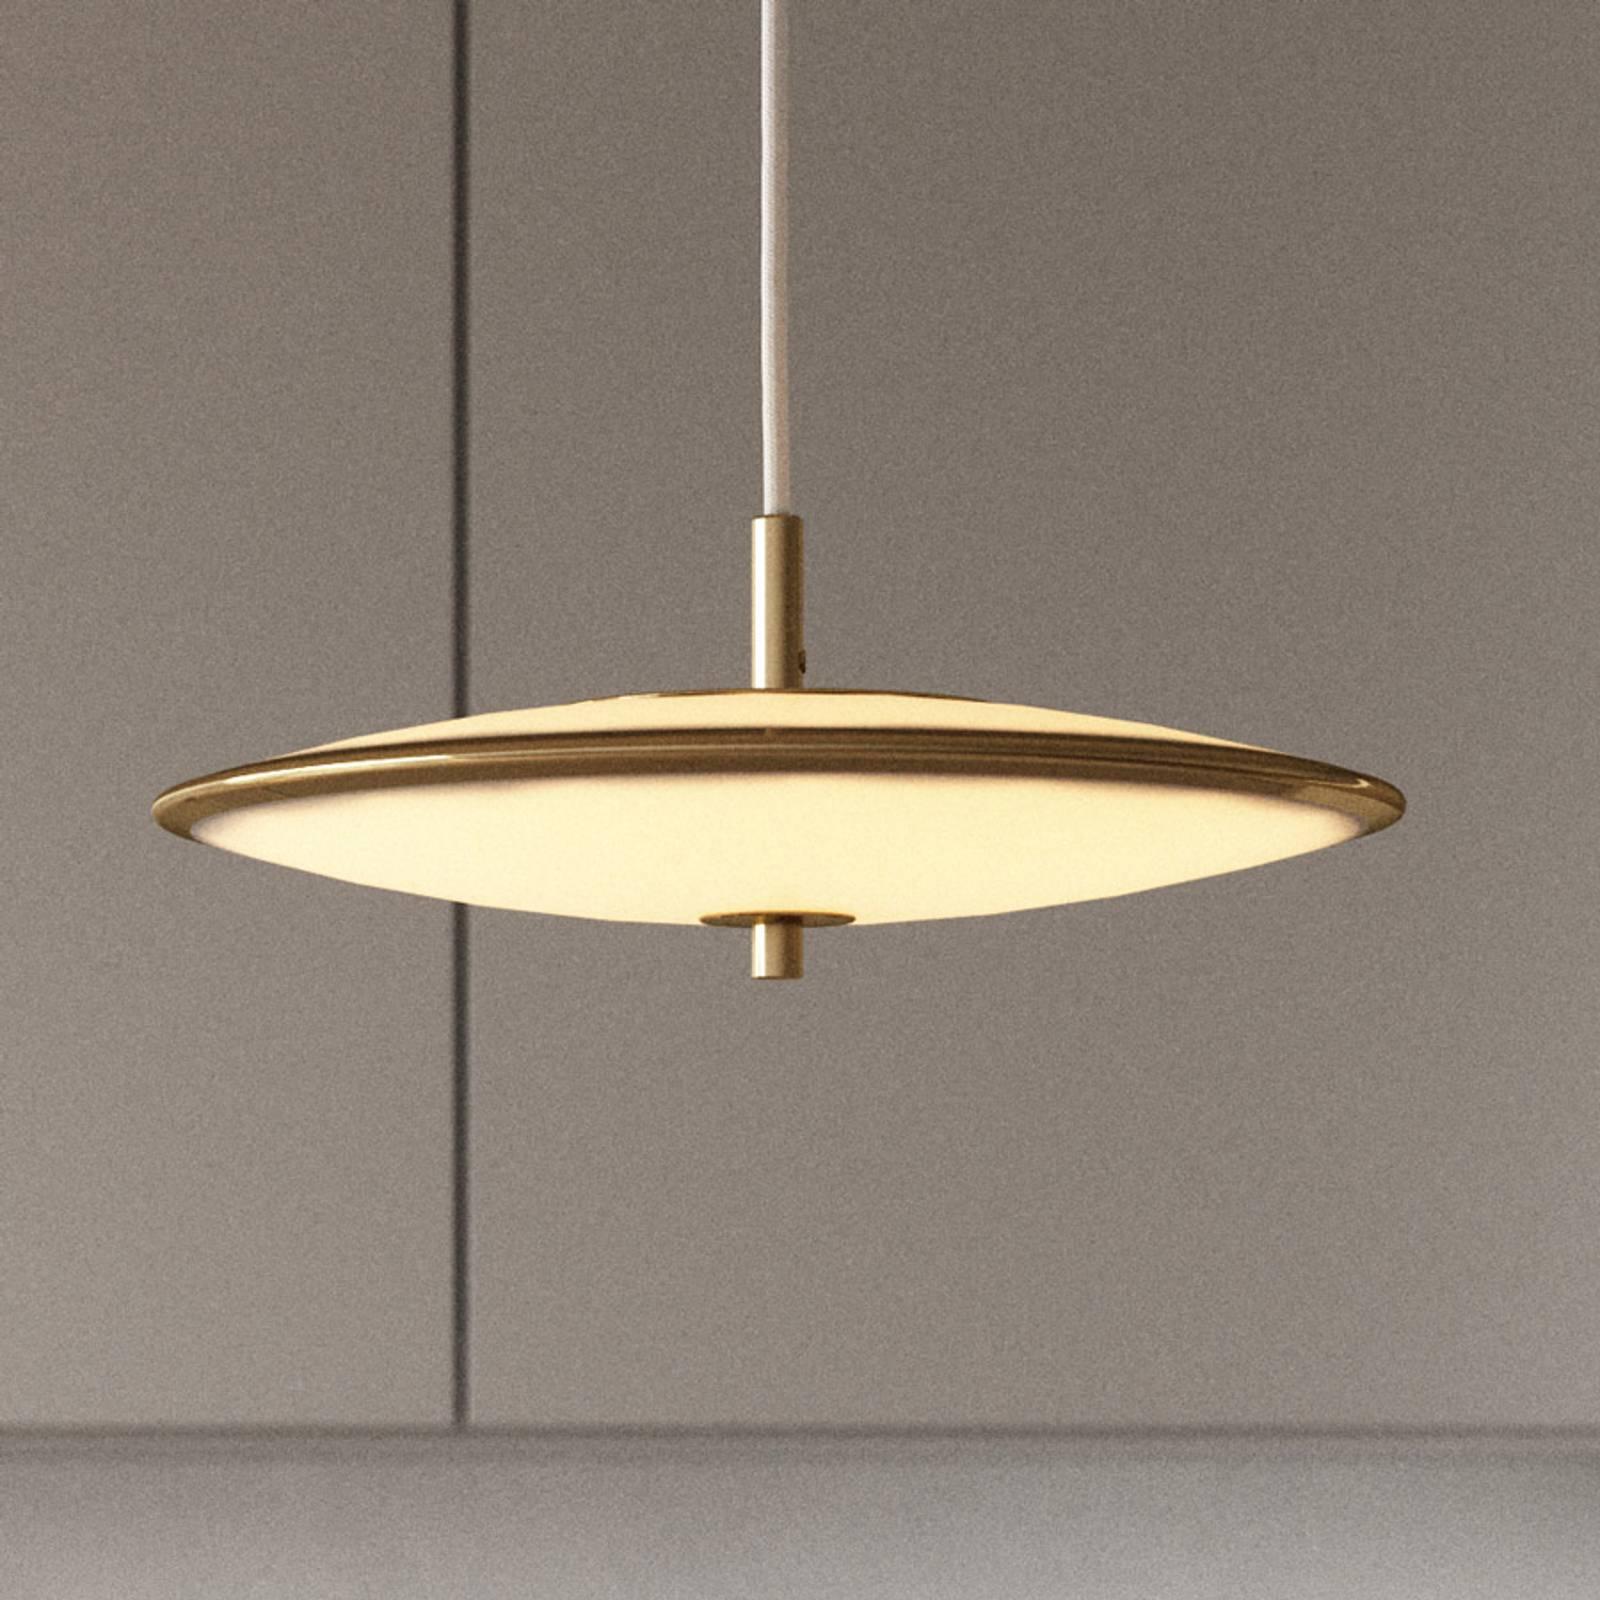 LED-Hängeleuchte Blanche, dimmbar, Ø 32 cm